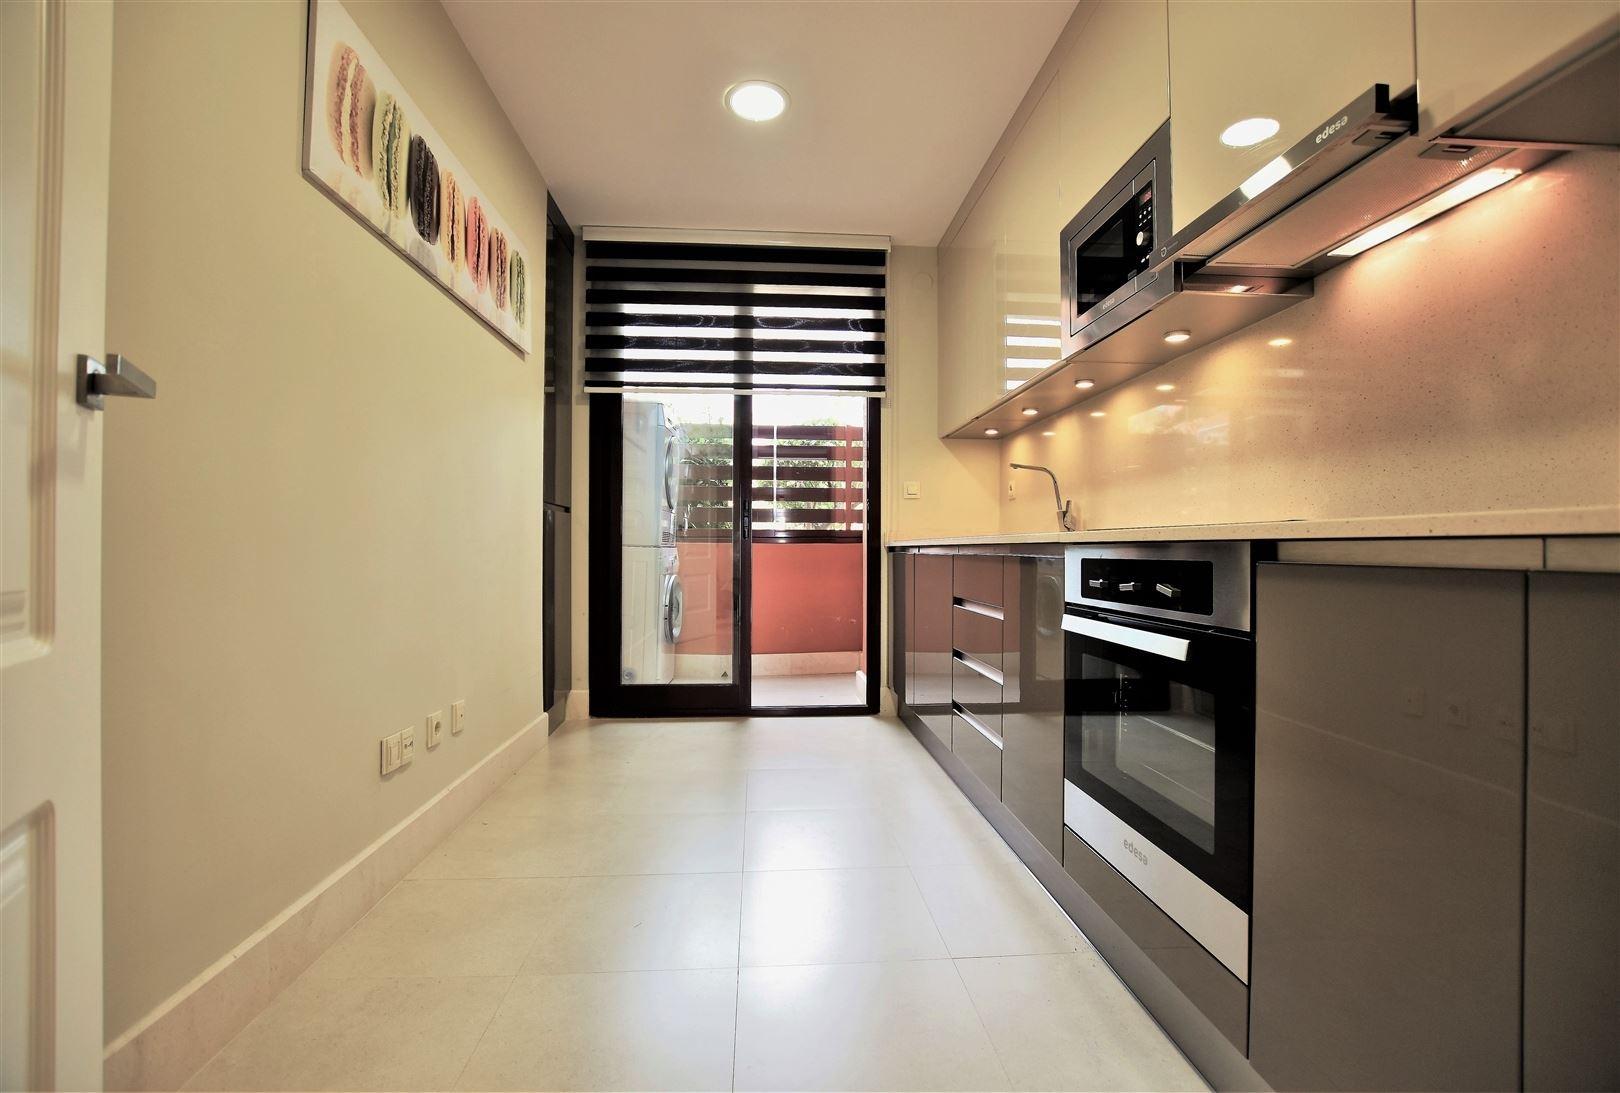 Foto 16 : Appartement te 29679 MARBELLA (Spanje) - Prijs € 1.750